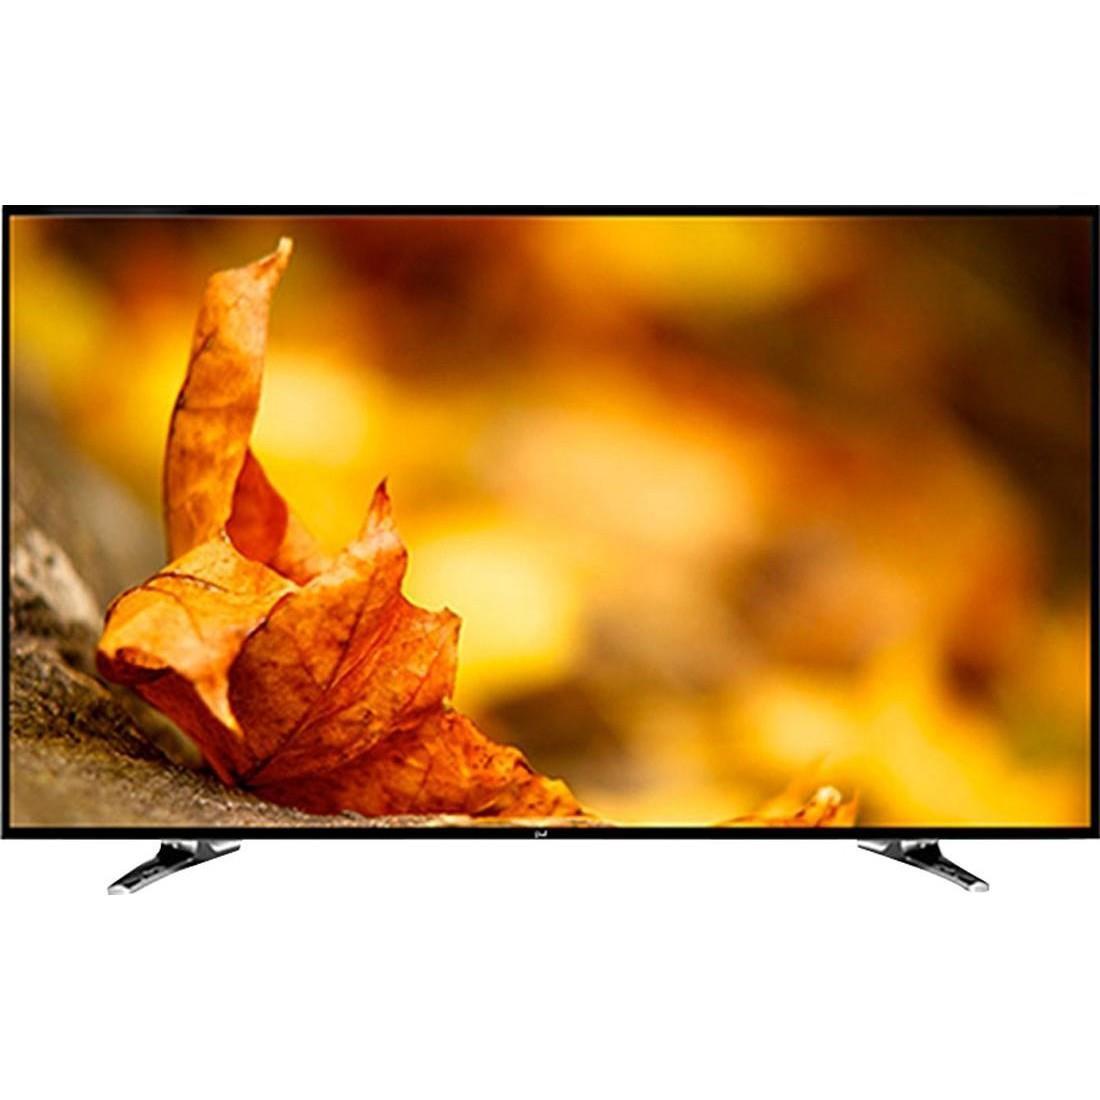 NOBLE 22CV22N01 56 cm (21.5) LED TV (HD Ready) Image